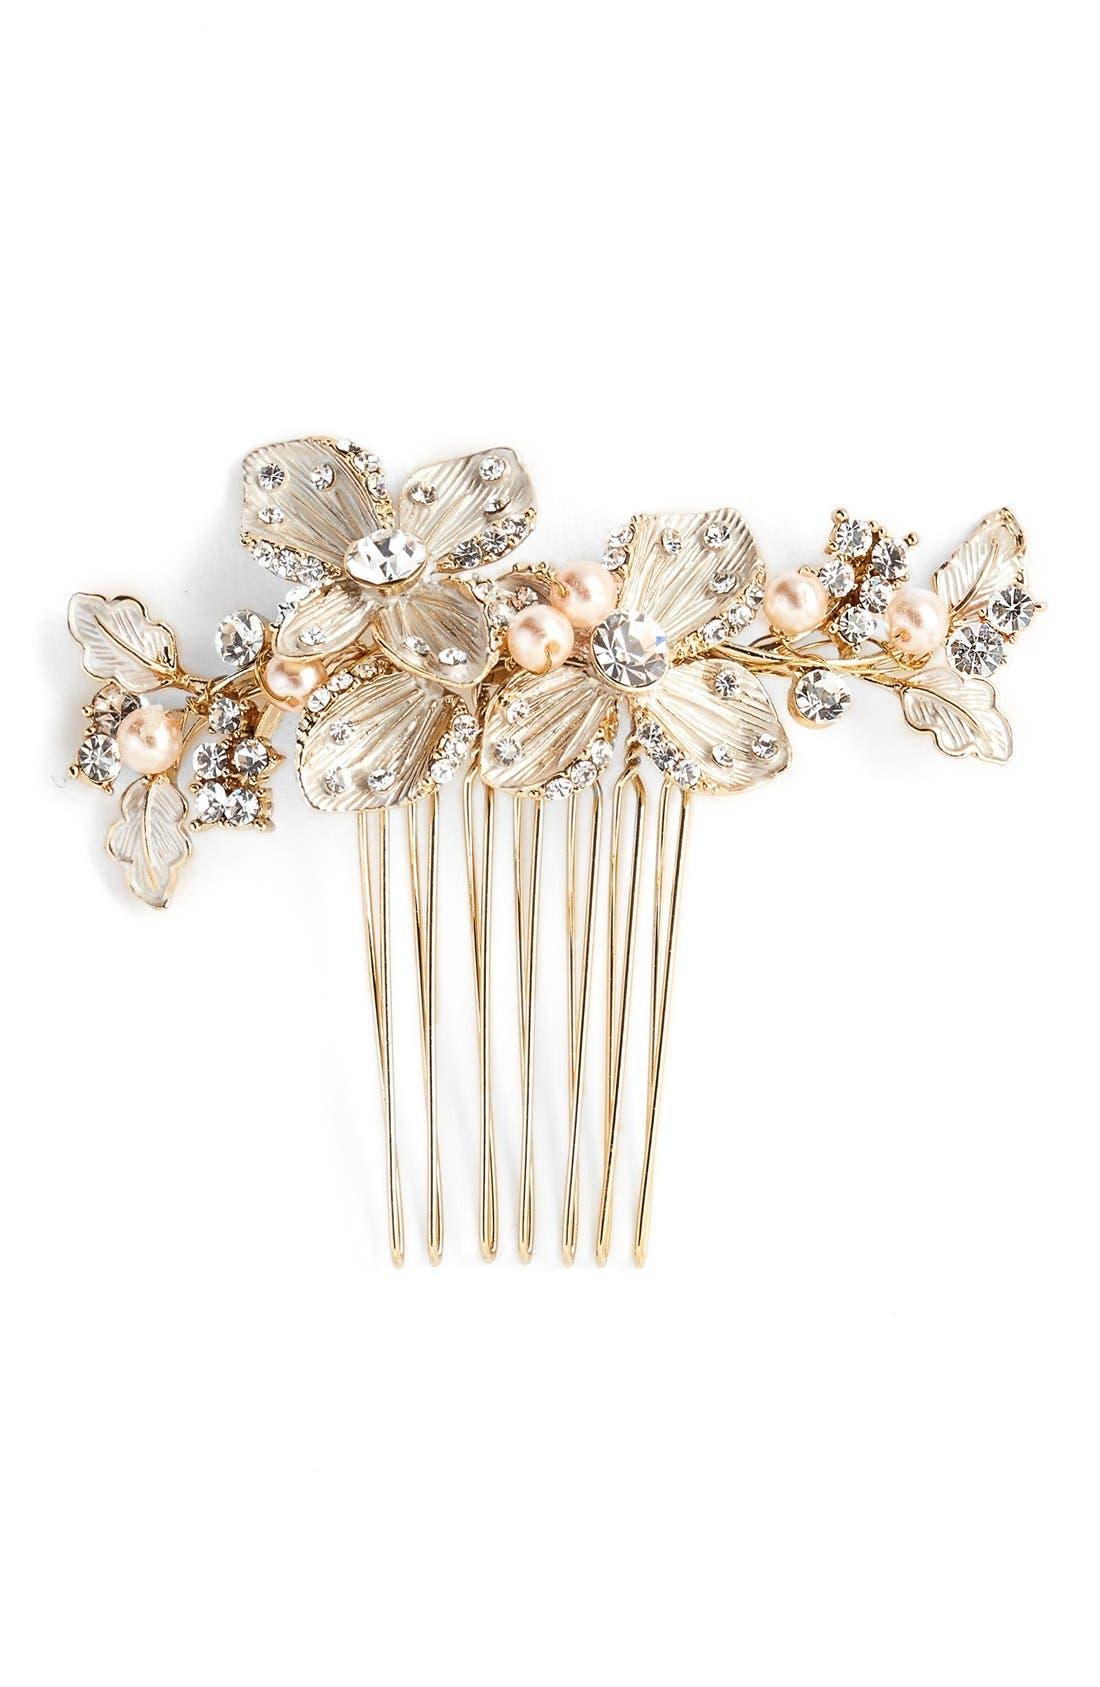 'Petite Garden' Crystal Hair Comb,                         Main,                         color, Gold/ Blush